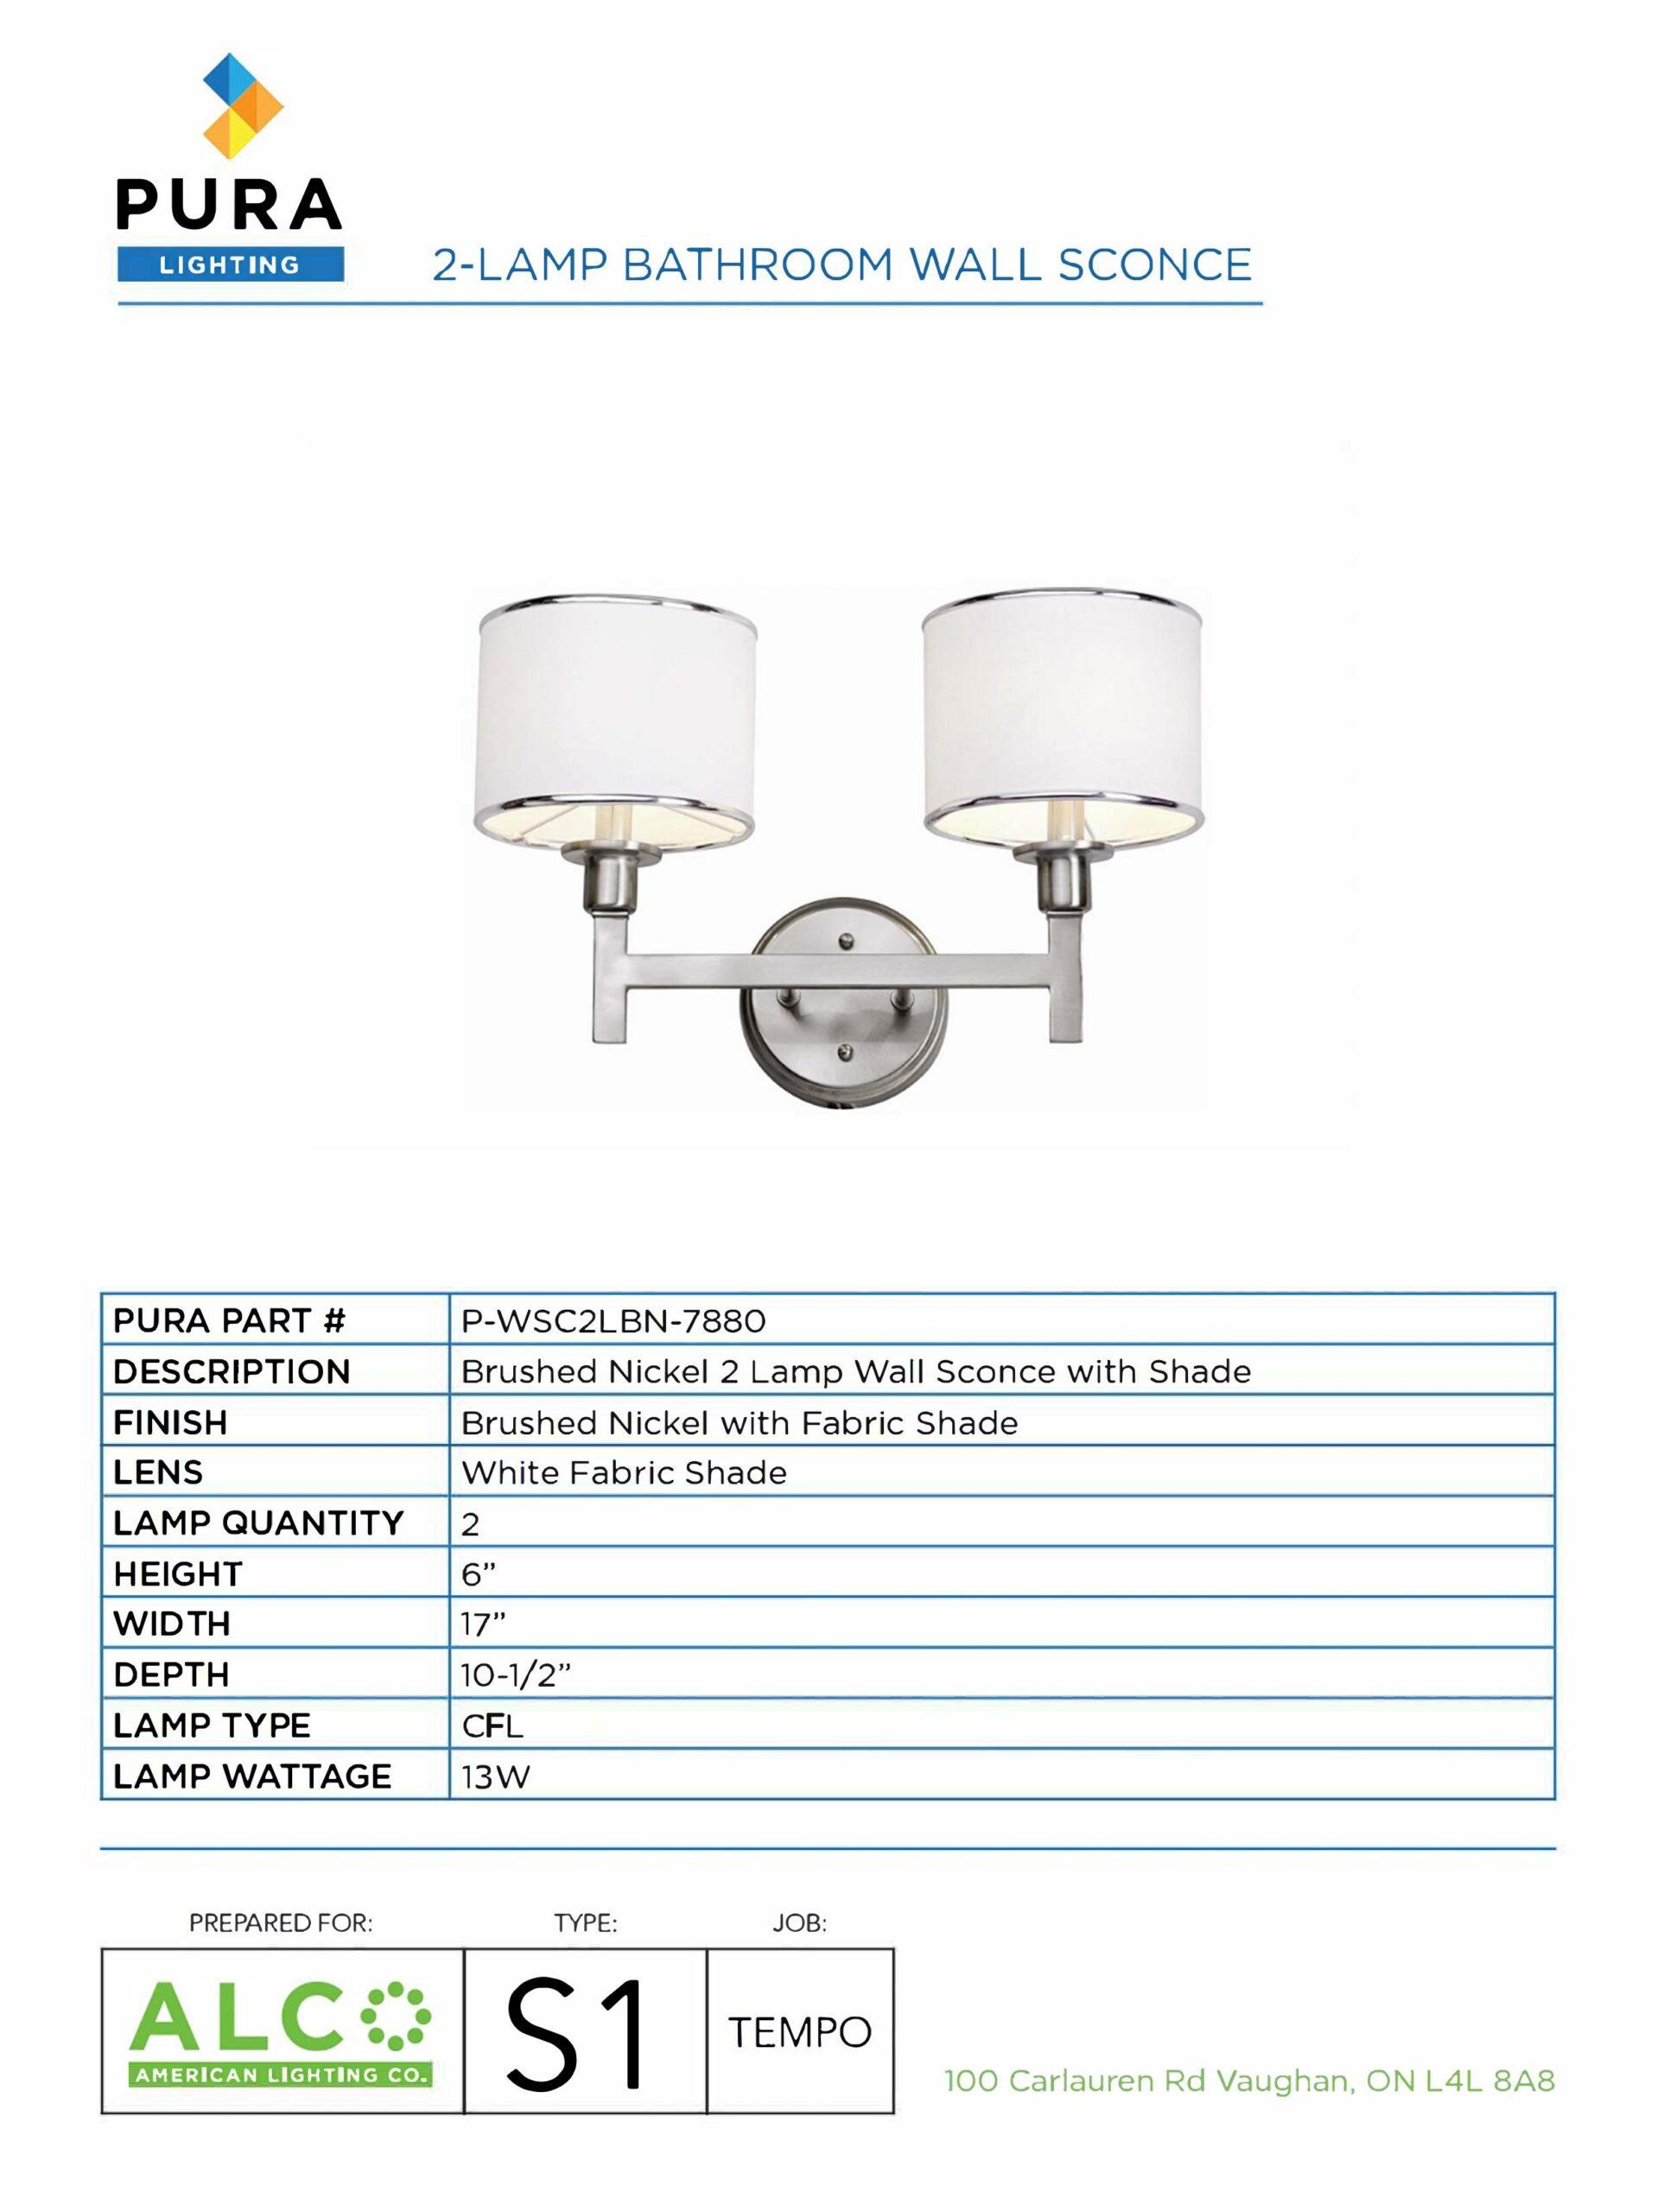 Original Pura Specification sheet